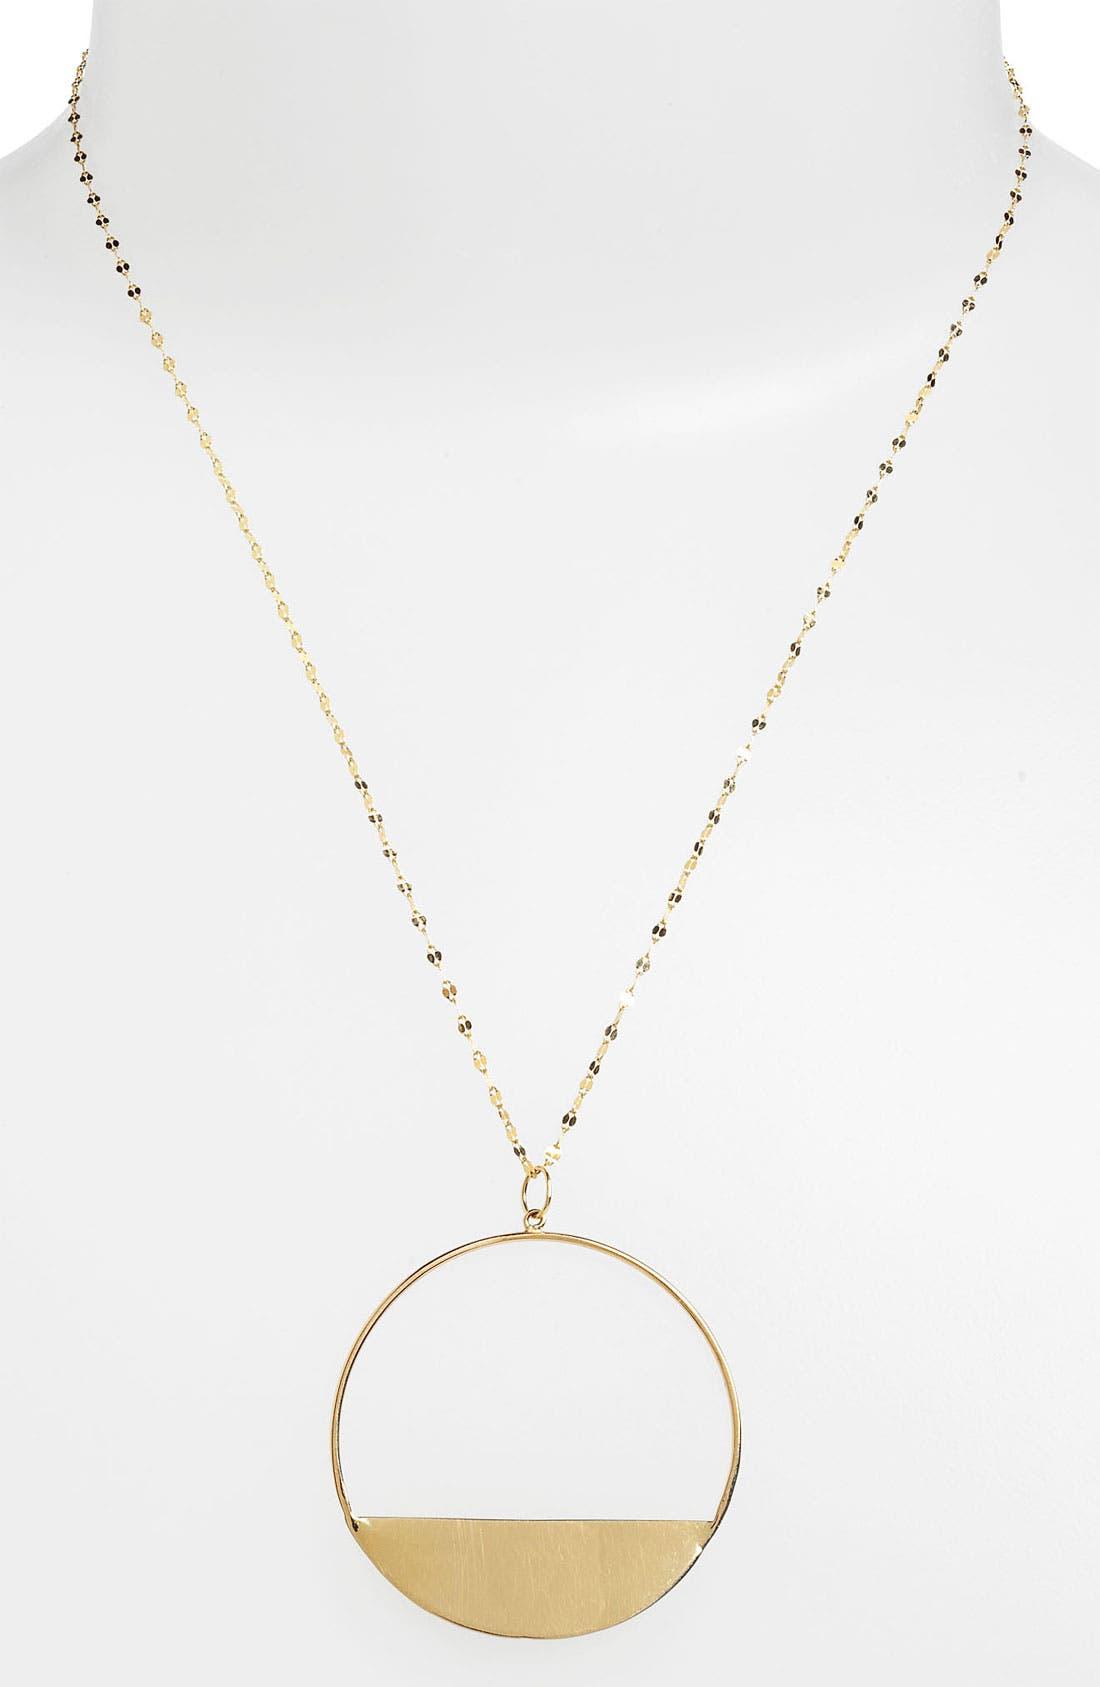 Main Image - Lana Jewelry Medium Eclipse Pendant Necklace